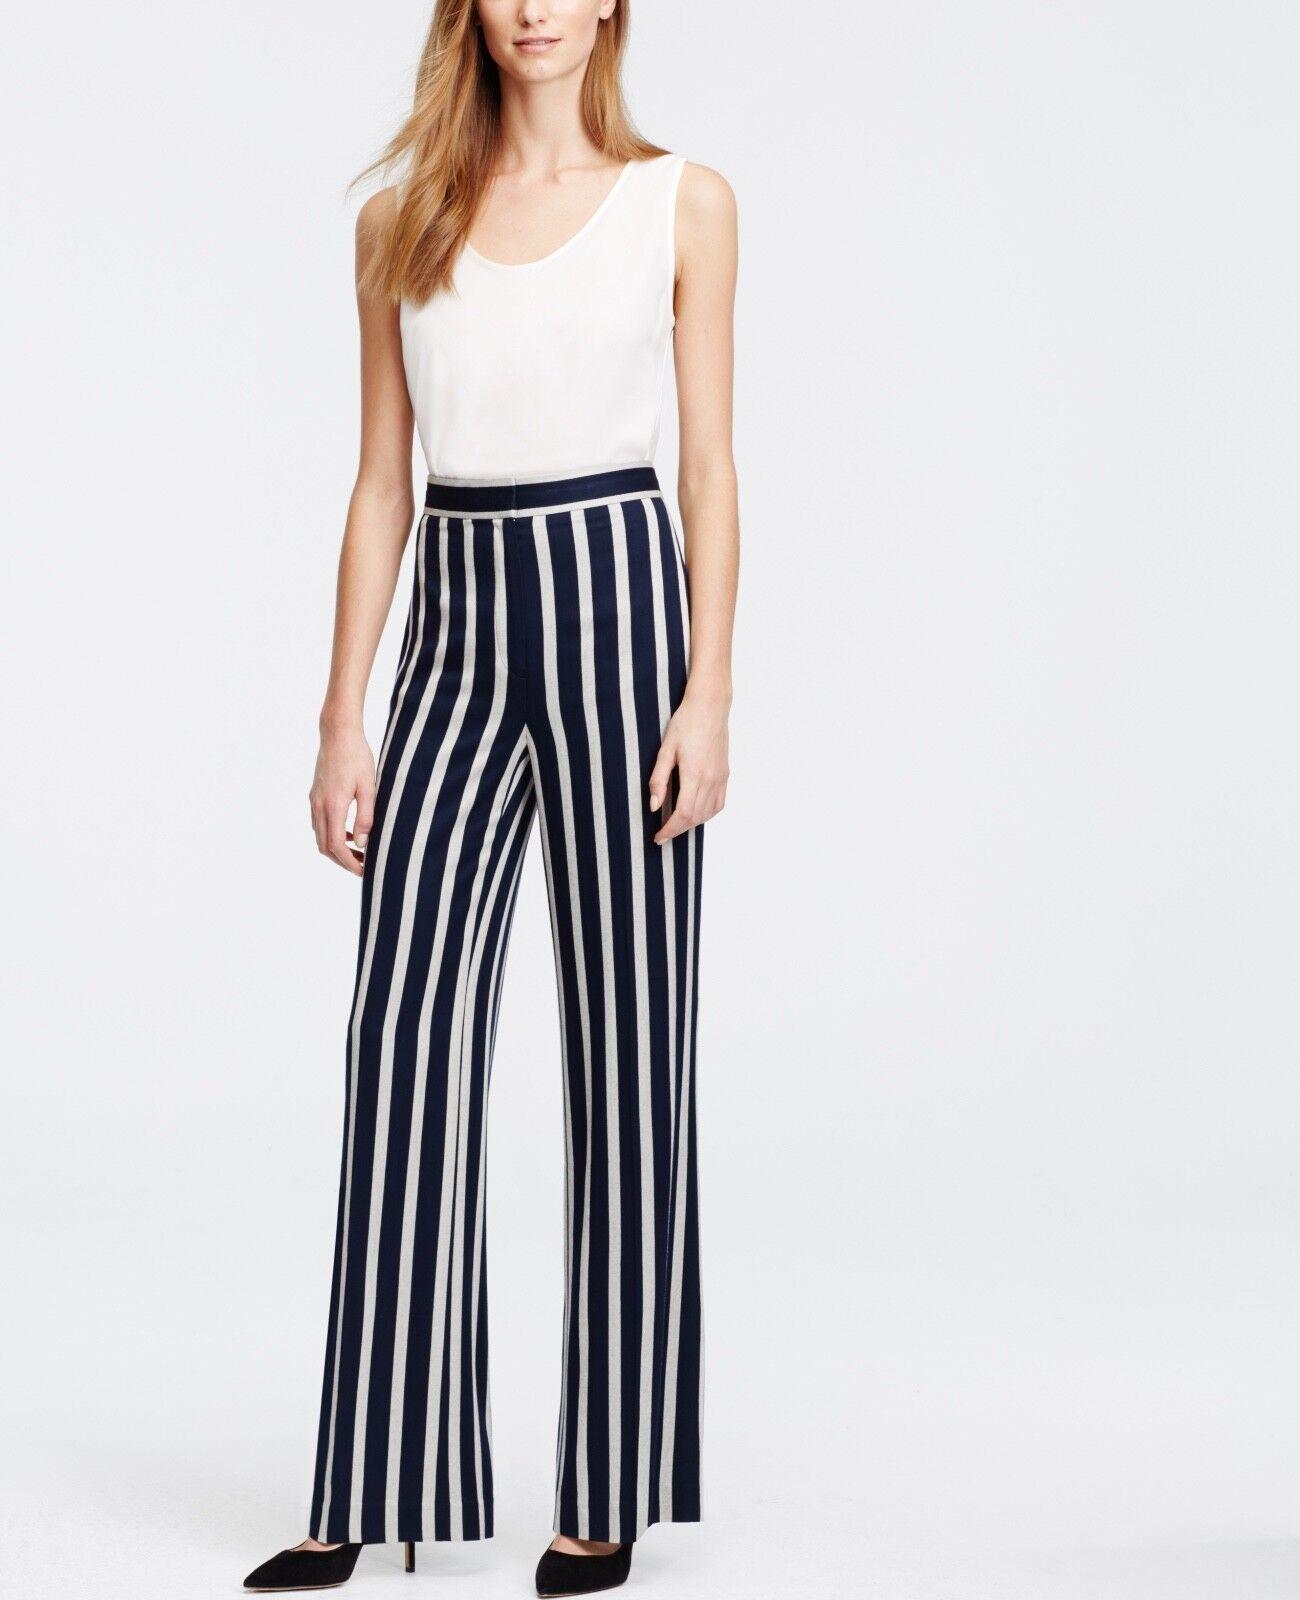 Ann Taylor Womens bluee Tall Fluid Stripe High Waist Flare Trousers 16T Tall Long